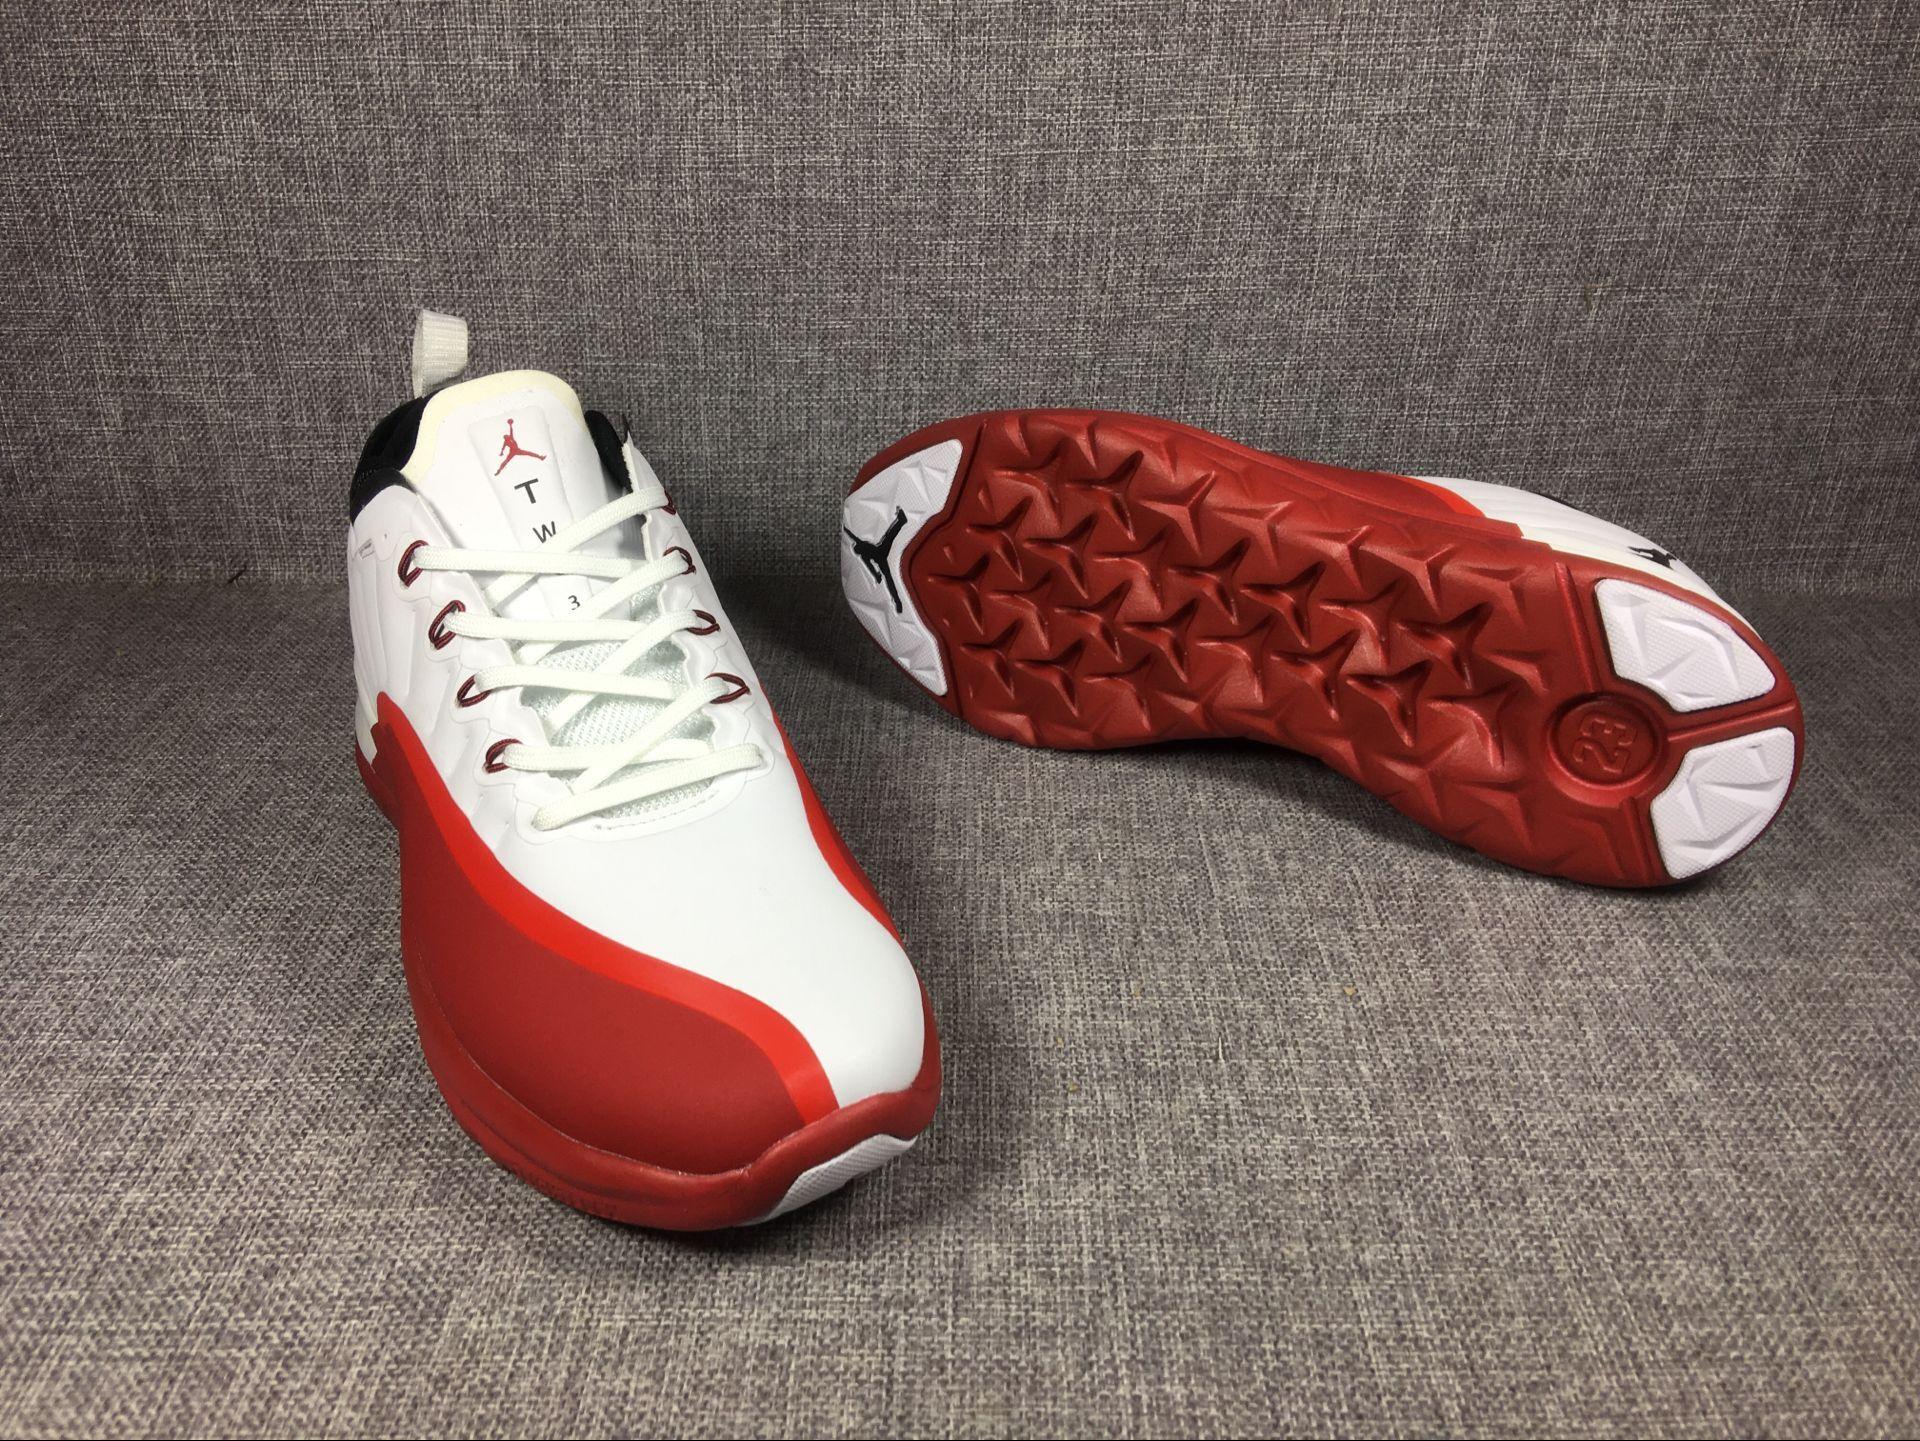 ac47cd39ede7 2018 Men Air Jordan 12.5 Low White Red Shoes  18women5417  -  91.00 ...